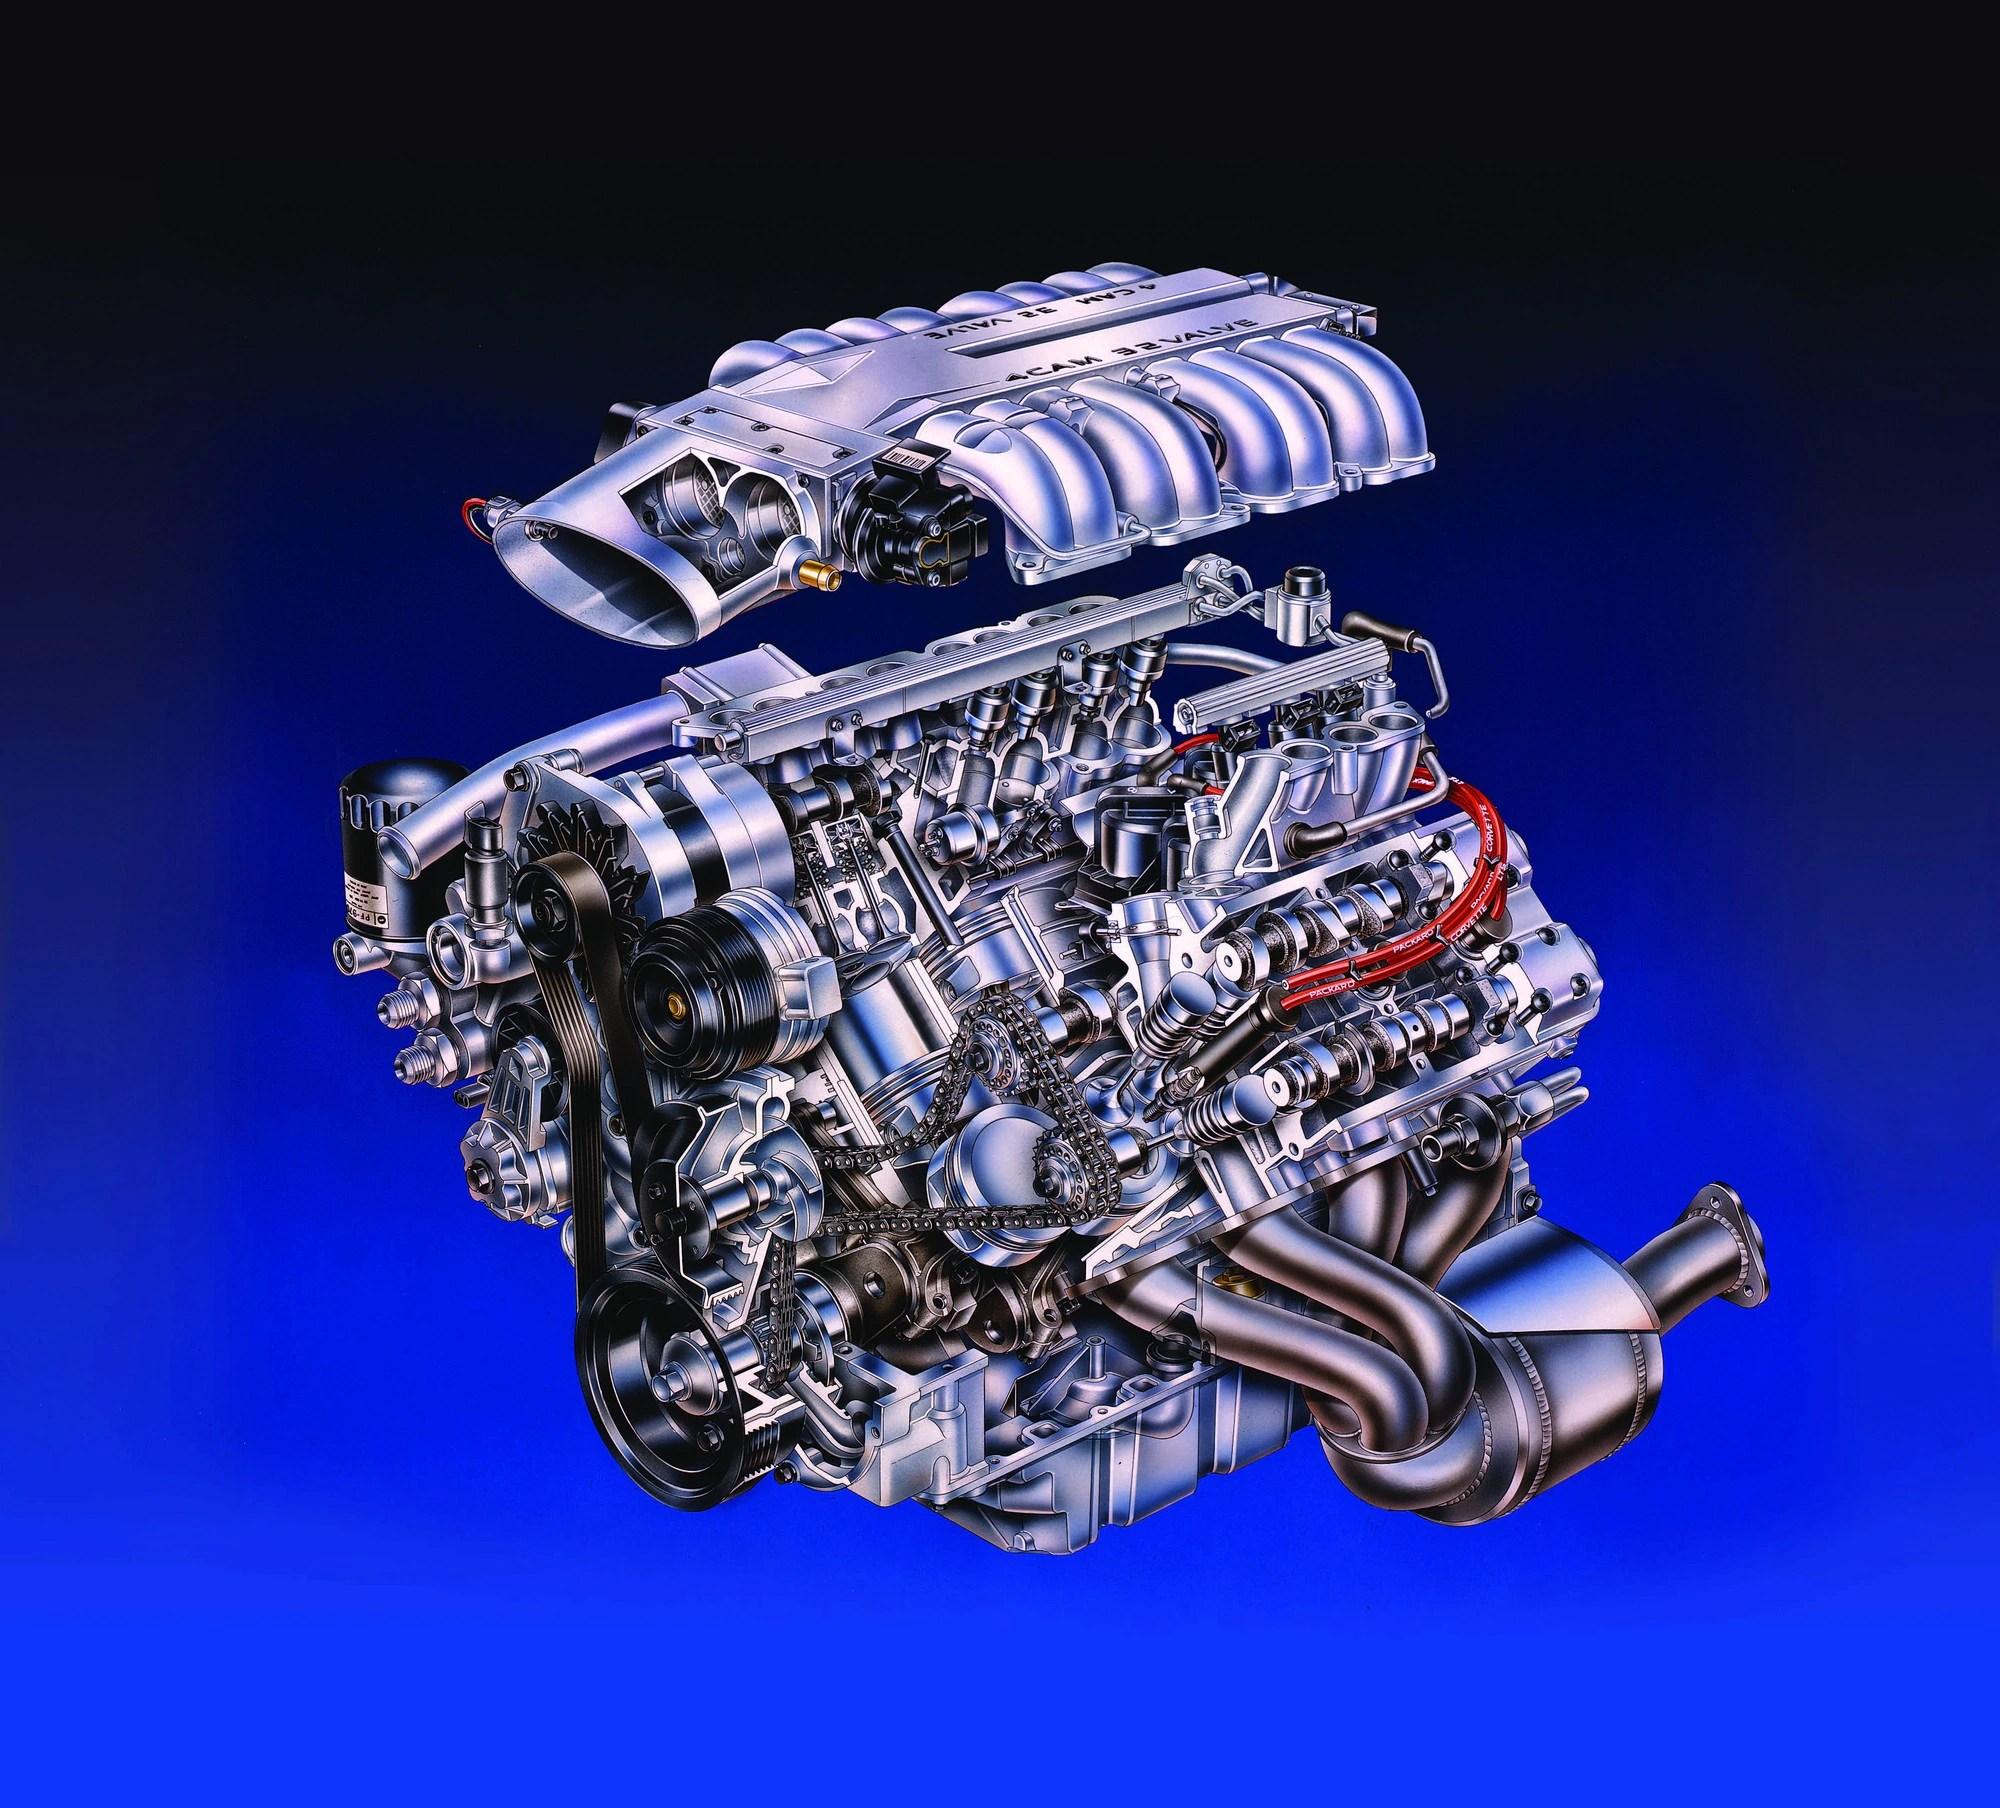 medium resolution of 1981 corvette engine diagram wiring library rh 2 embracingprevention org zr1 lt5 engine lt4 engine